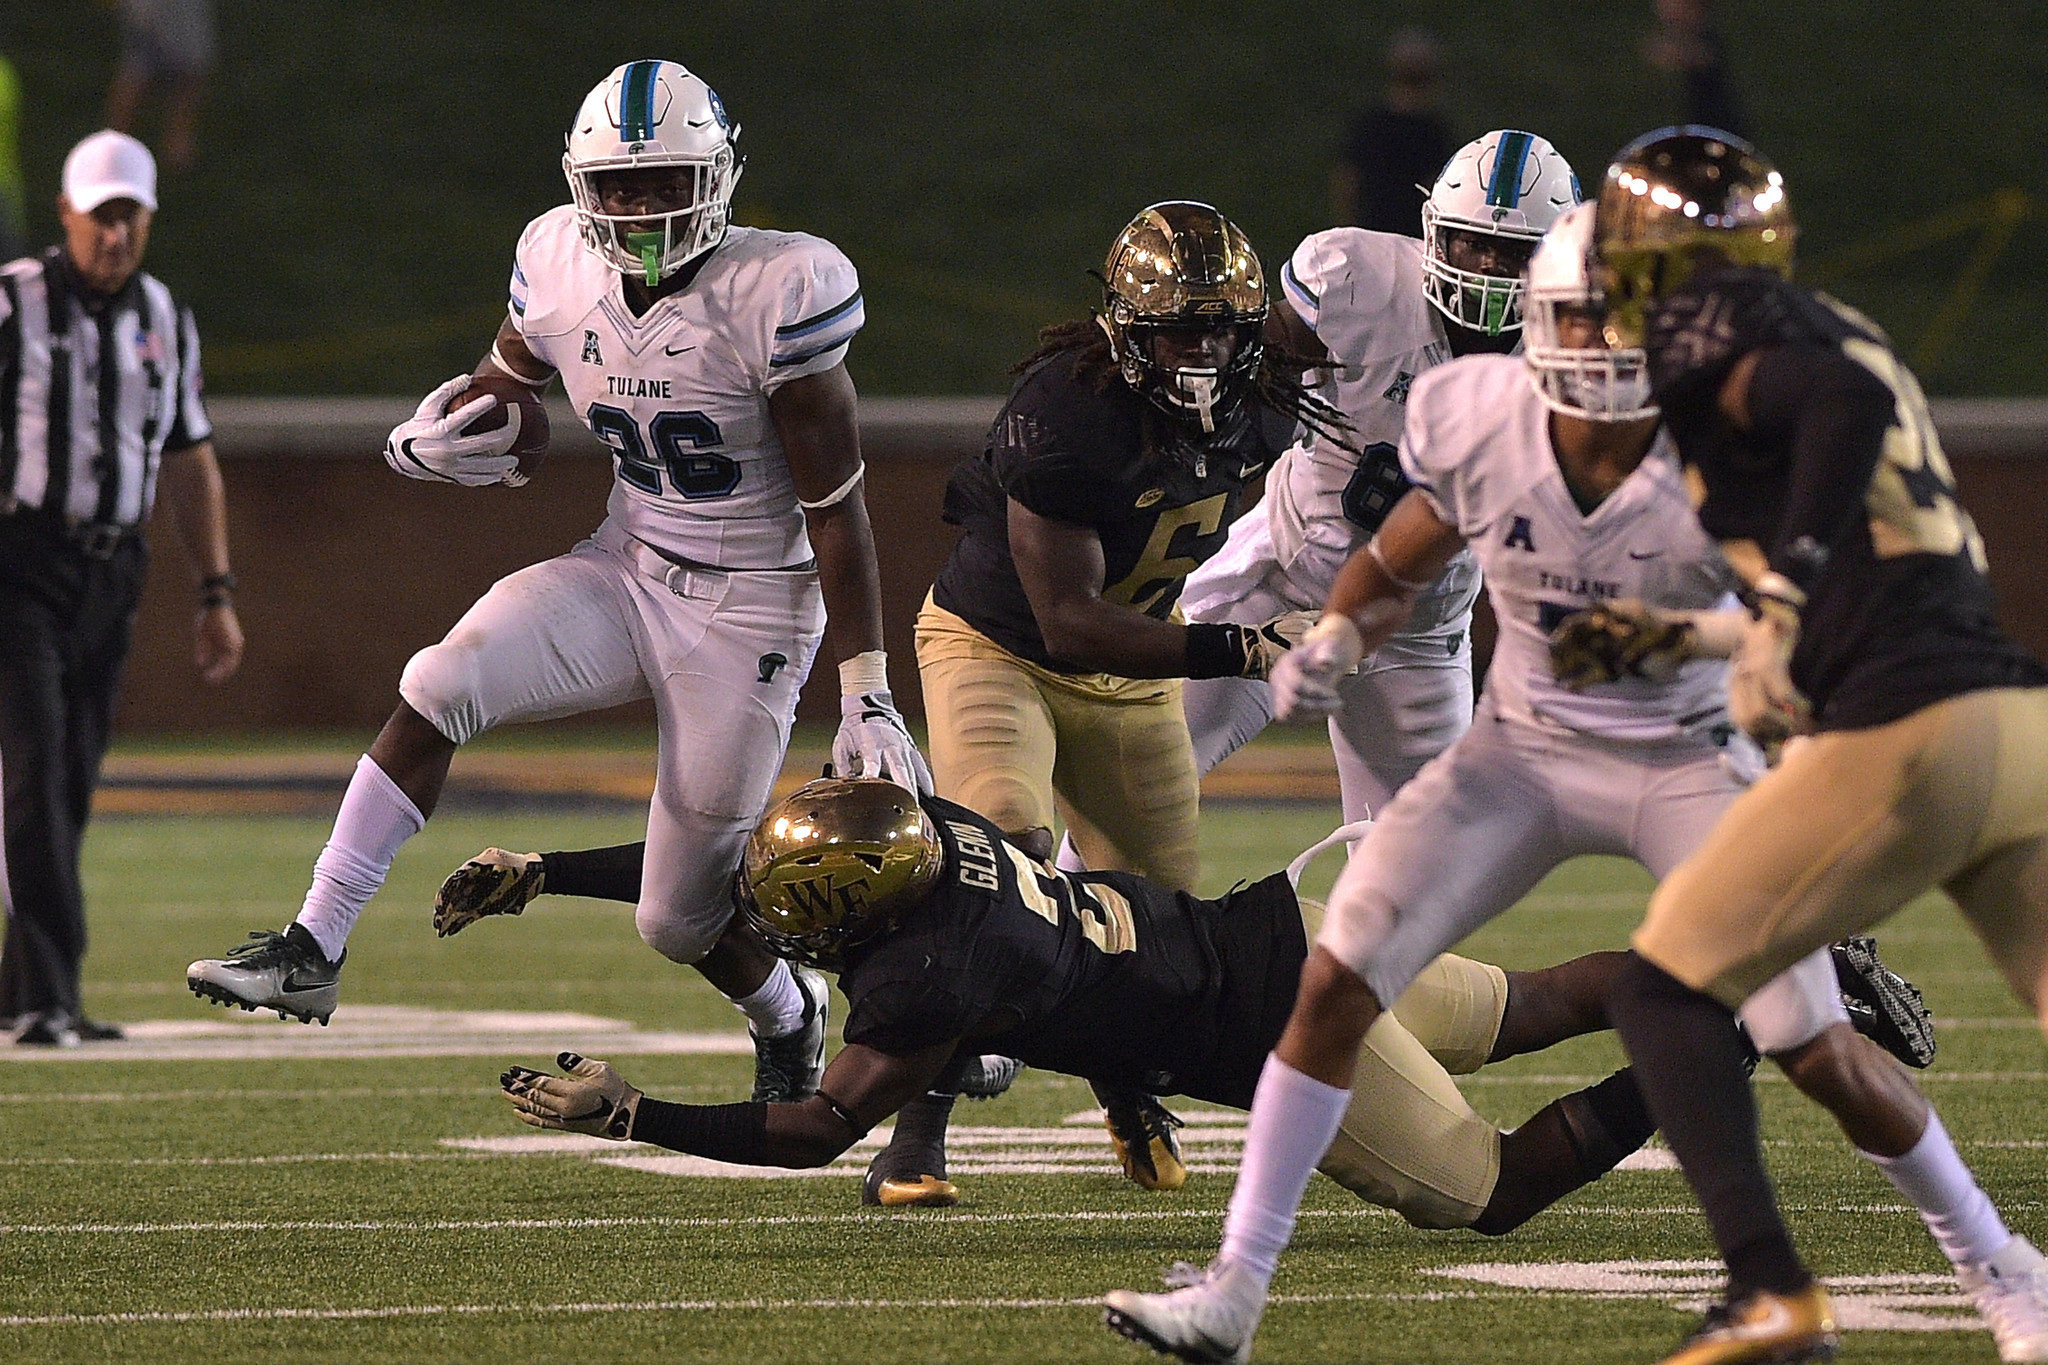 College Football Rankings: Tulane Green Wave